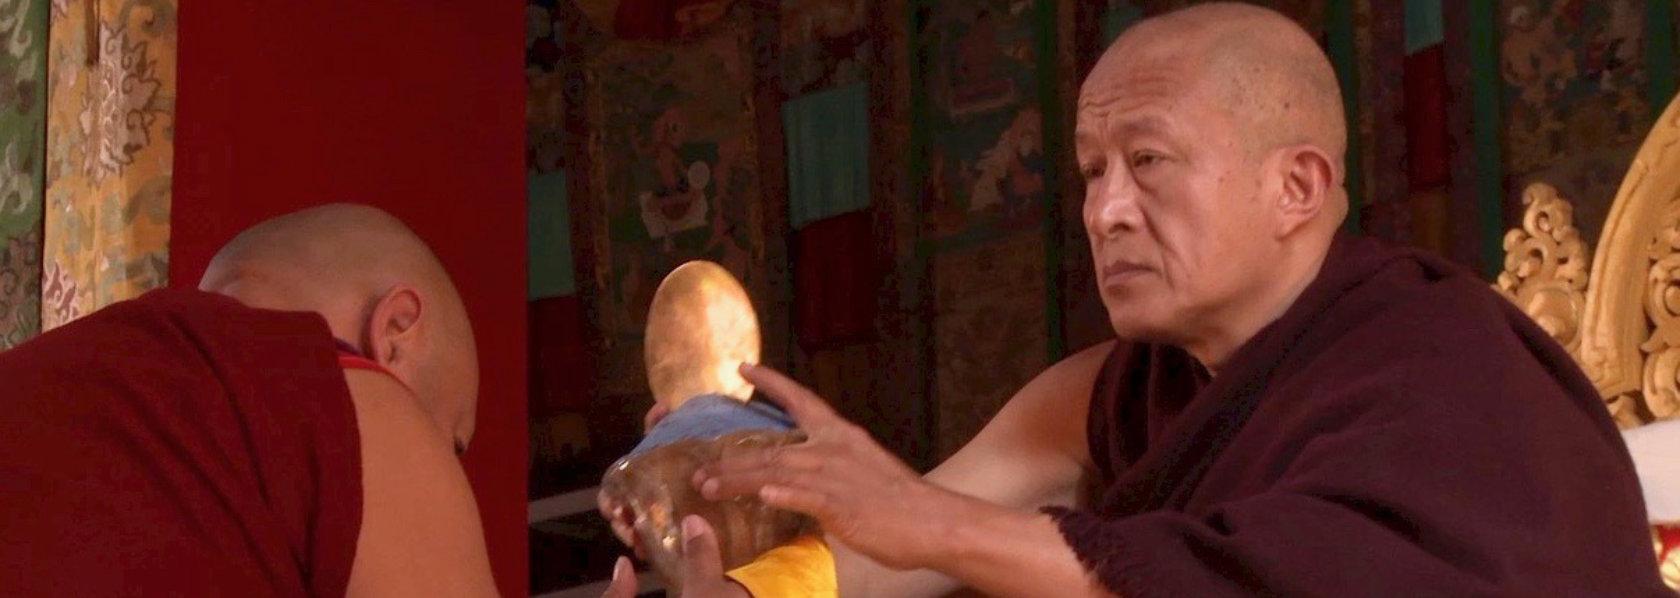 Dzongsar Khyentse Rinpoche performing ritual - Visions of a Teacher - THIS Buddhist Film Festival